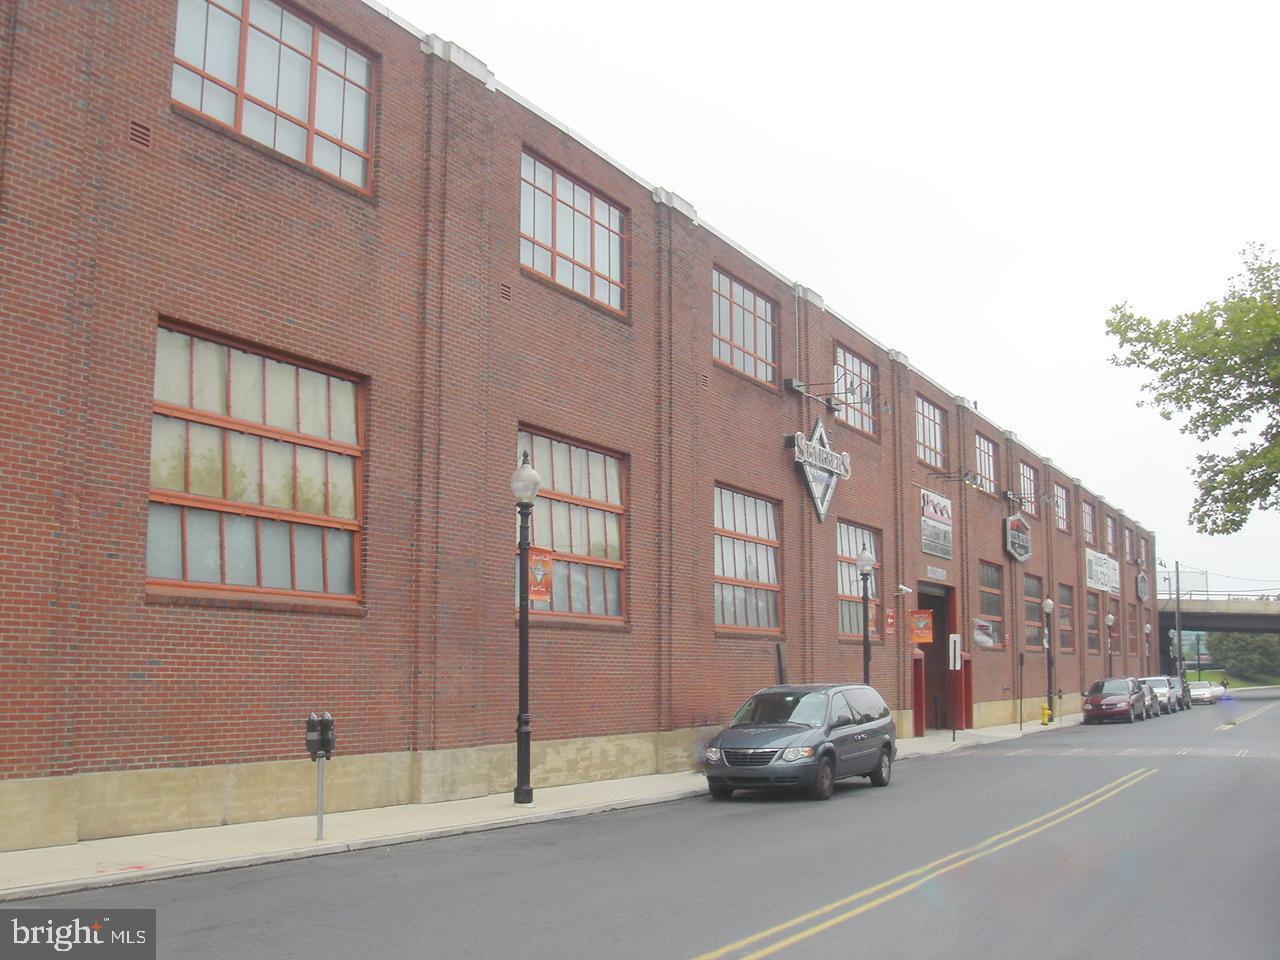 11 W 2ND STREET 104, BETHLEHEM, PA 18015